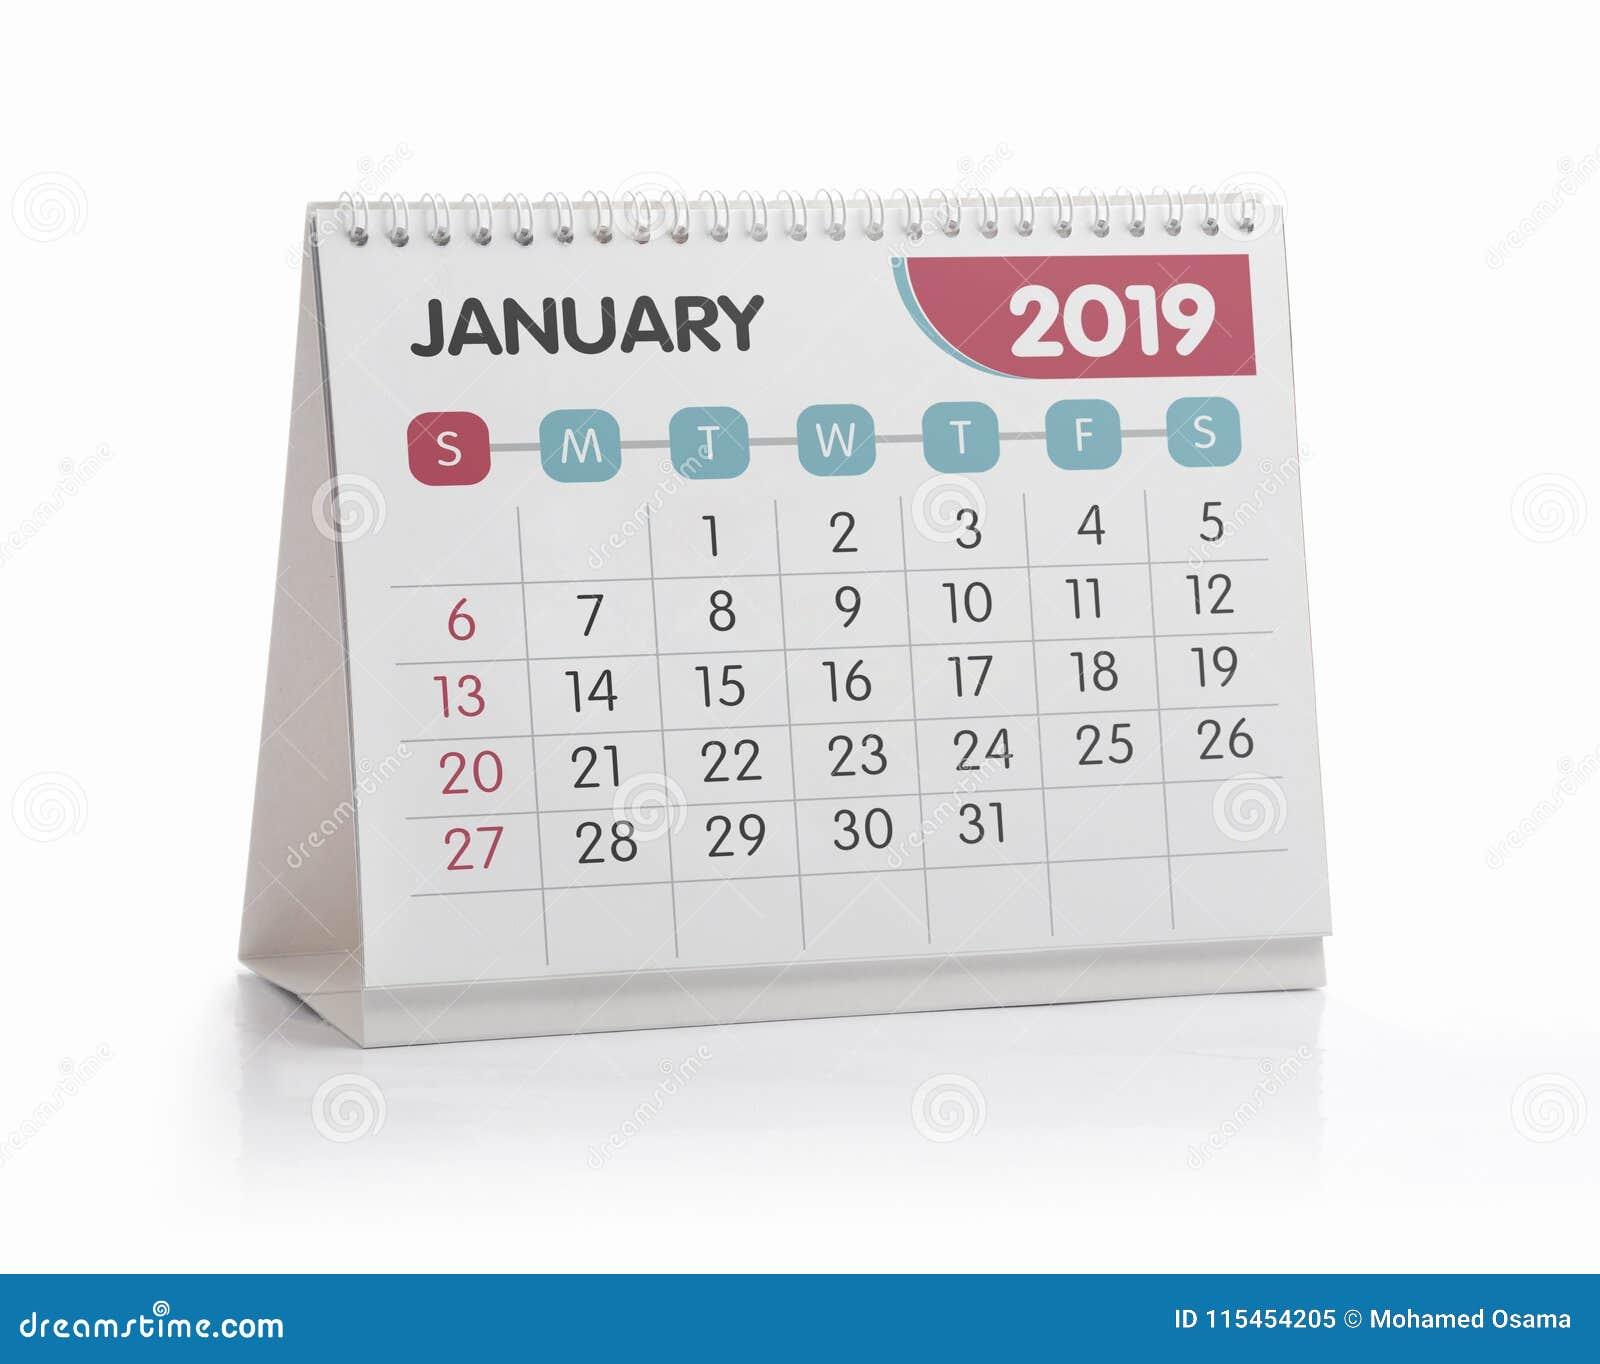 Office Calendar 2019 Office Calendar January 2019 Stock Image   Image of dates